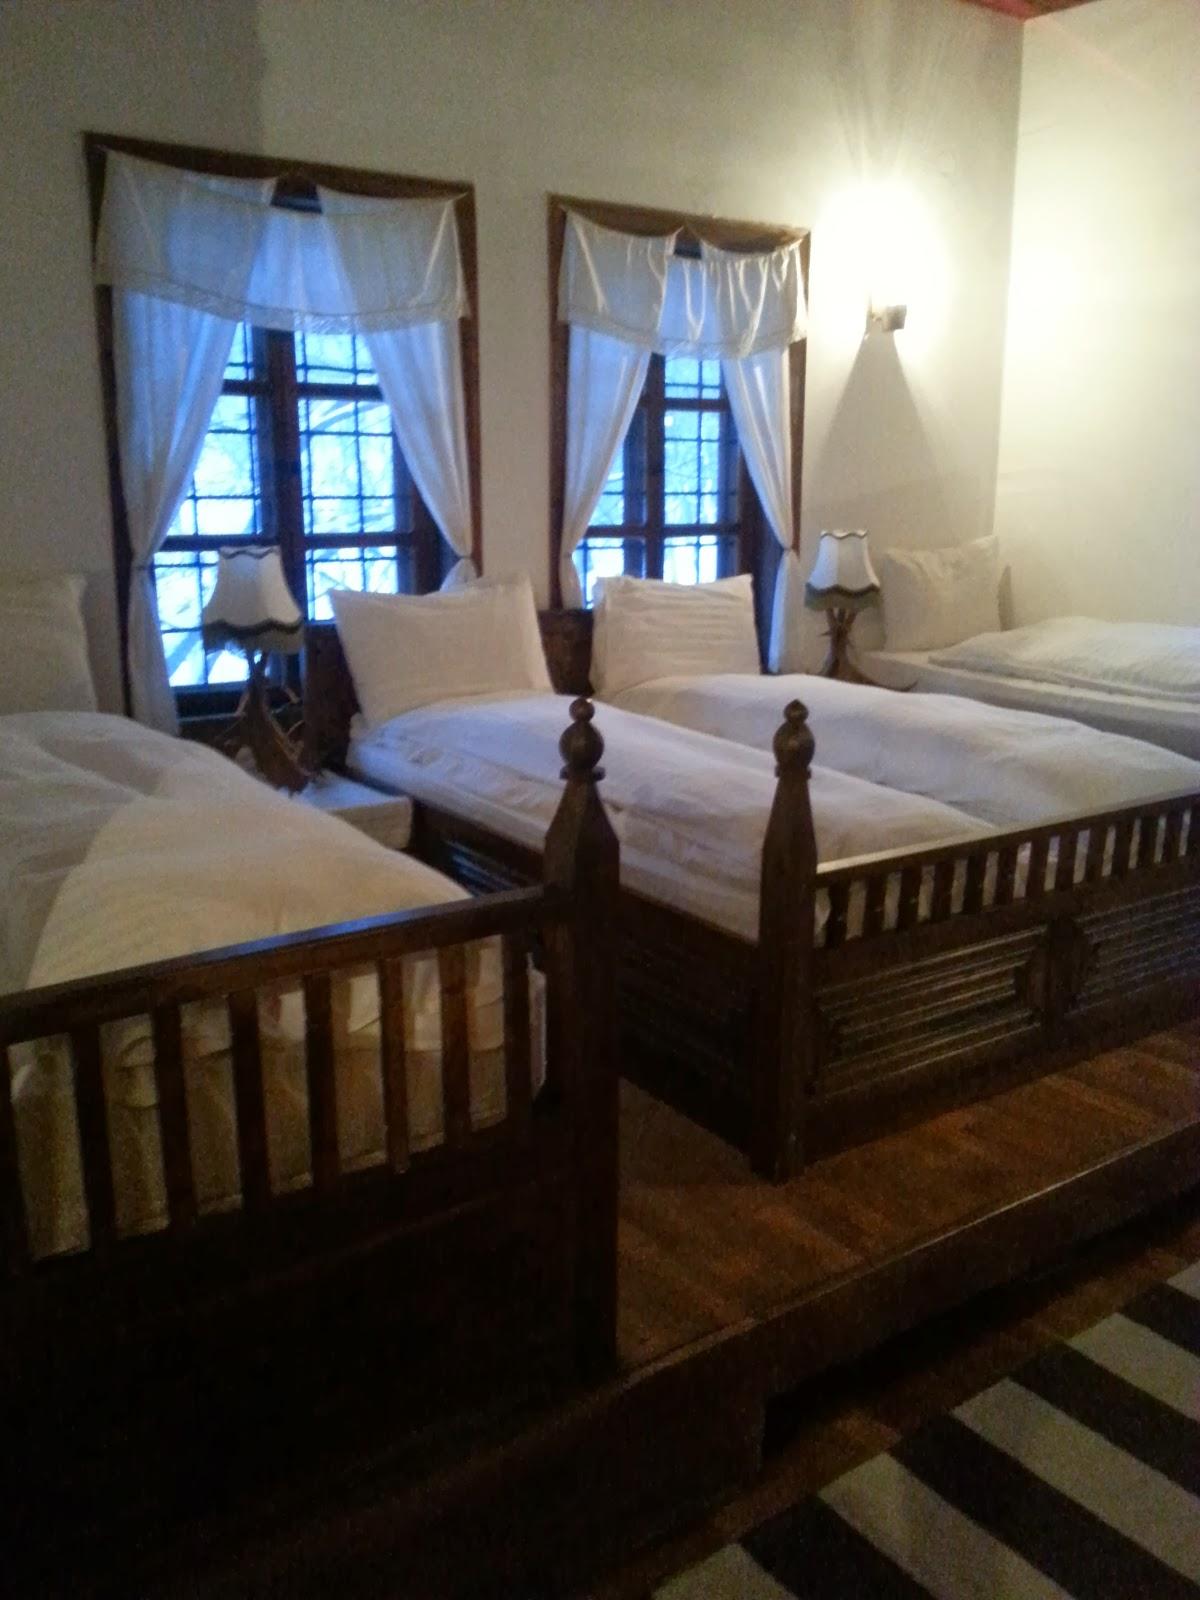 Arbanashki han bedroom